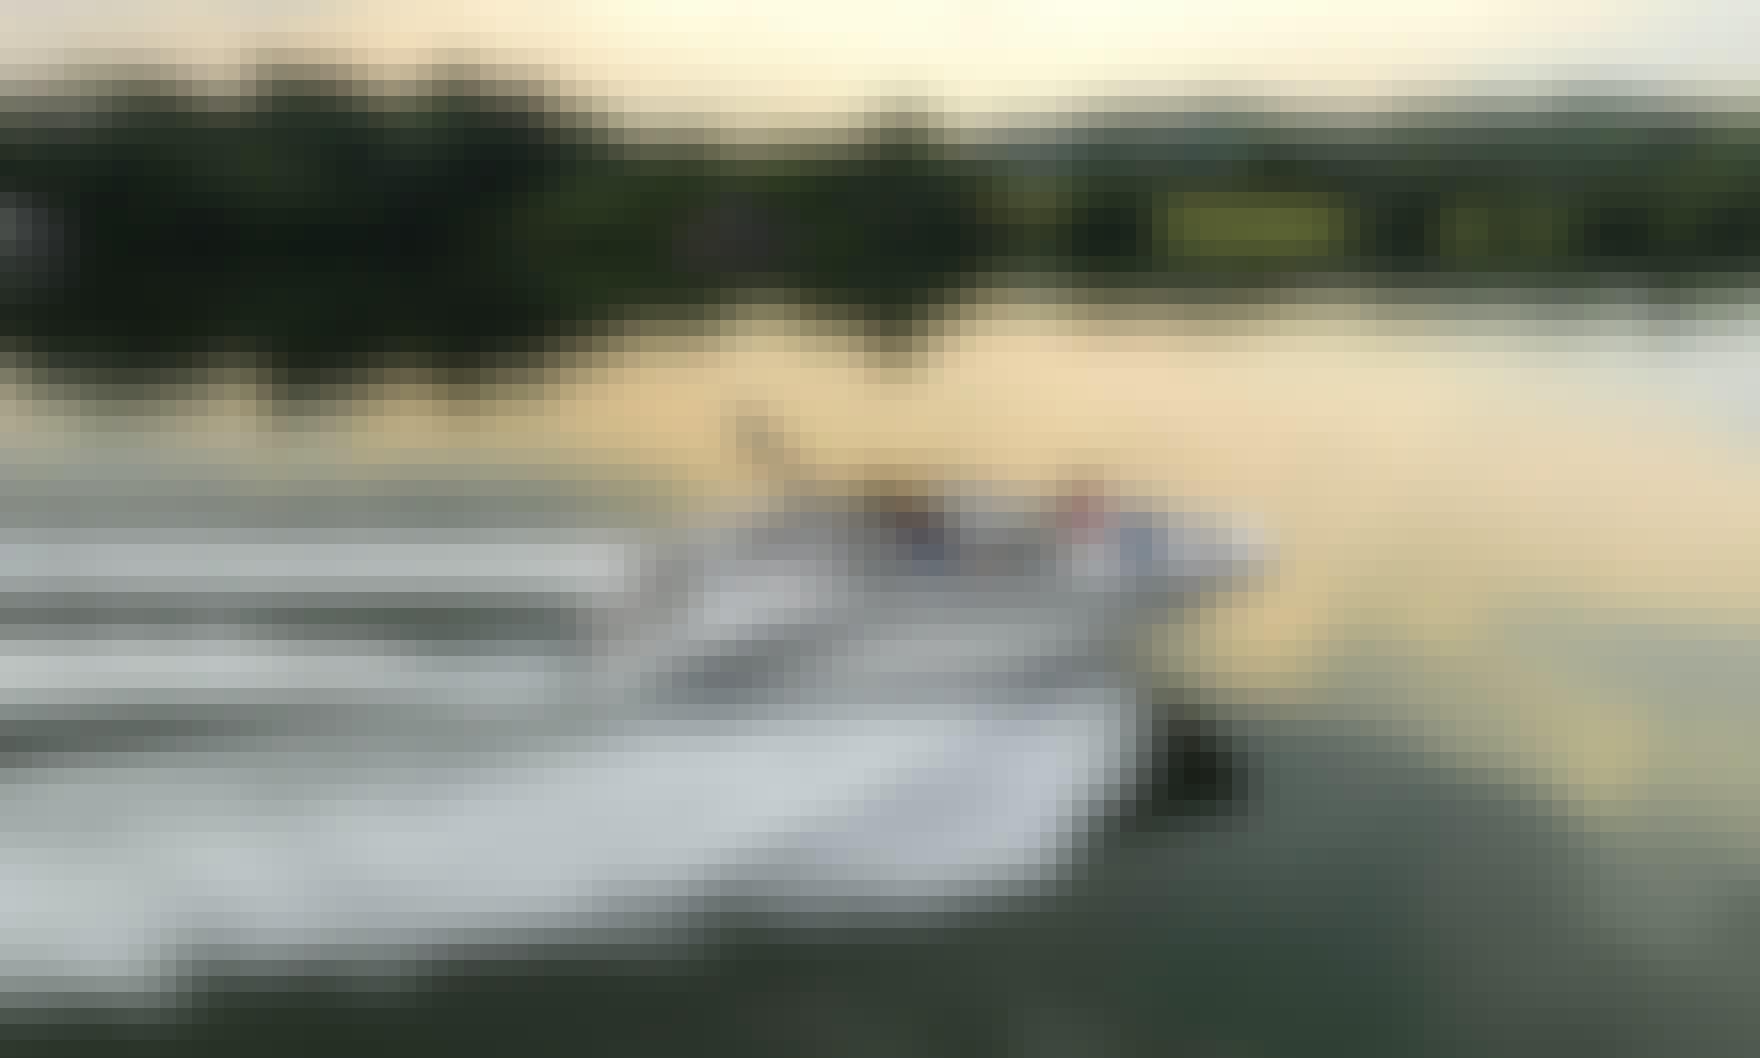 2020 Yamaha SX195 Jet Boat in Lake Lewisville